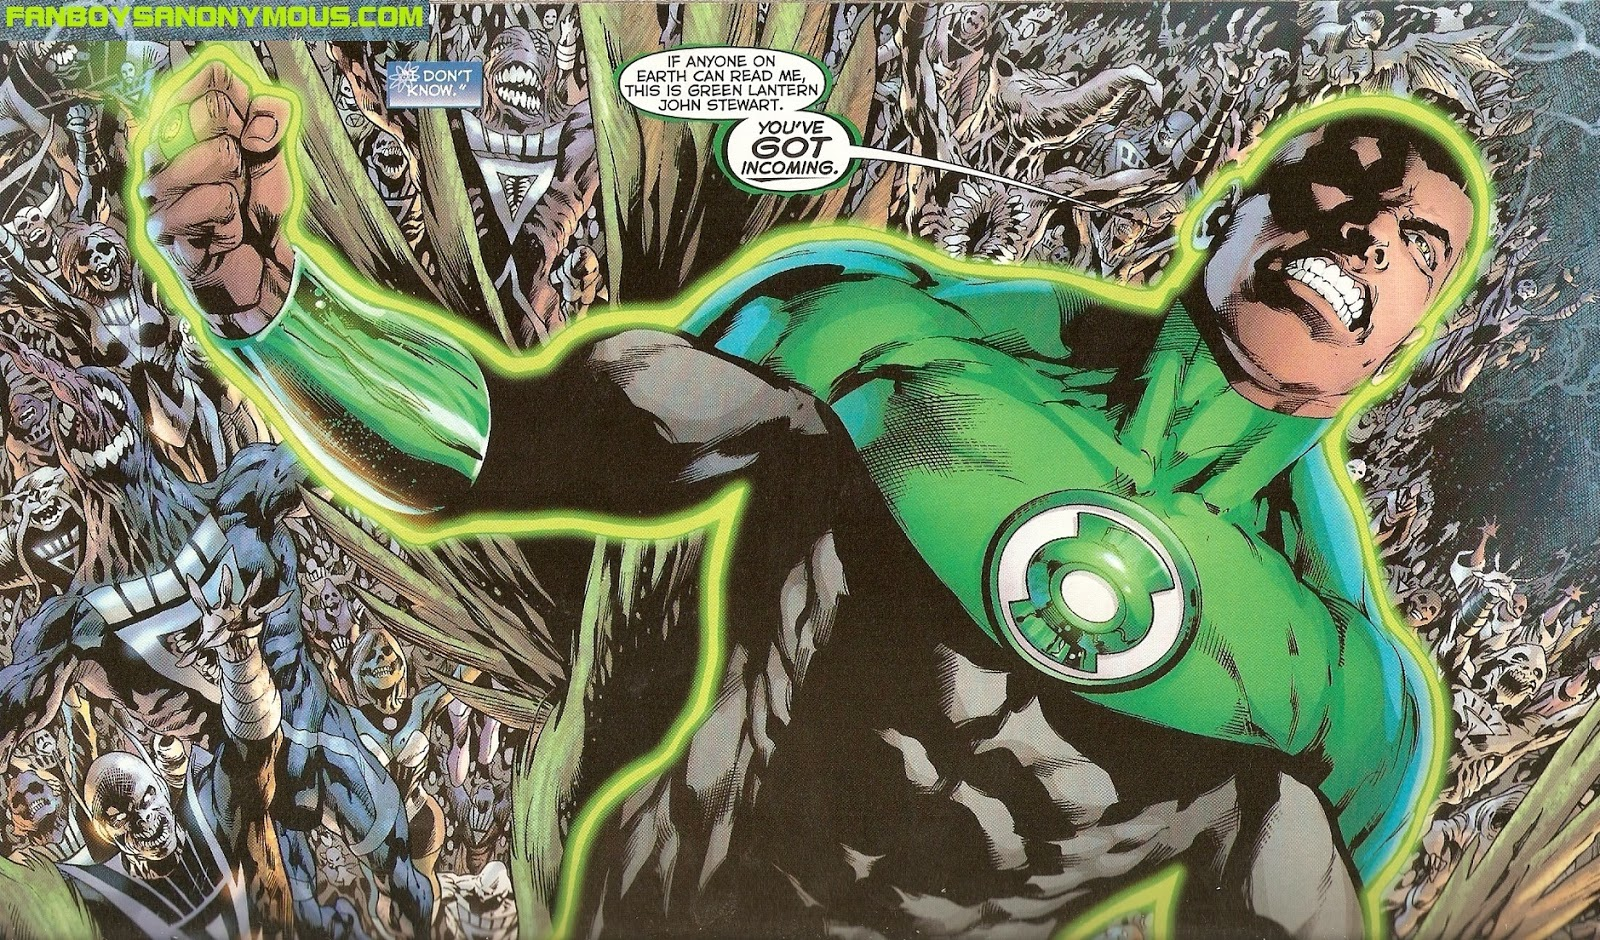 DC Green Lantern John Stewart In Blackest Night surviving the Black Lantern Corps